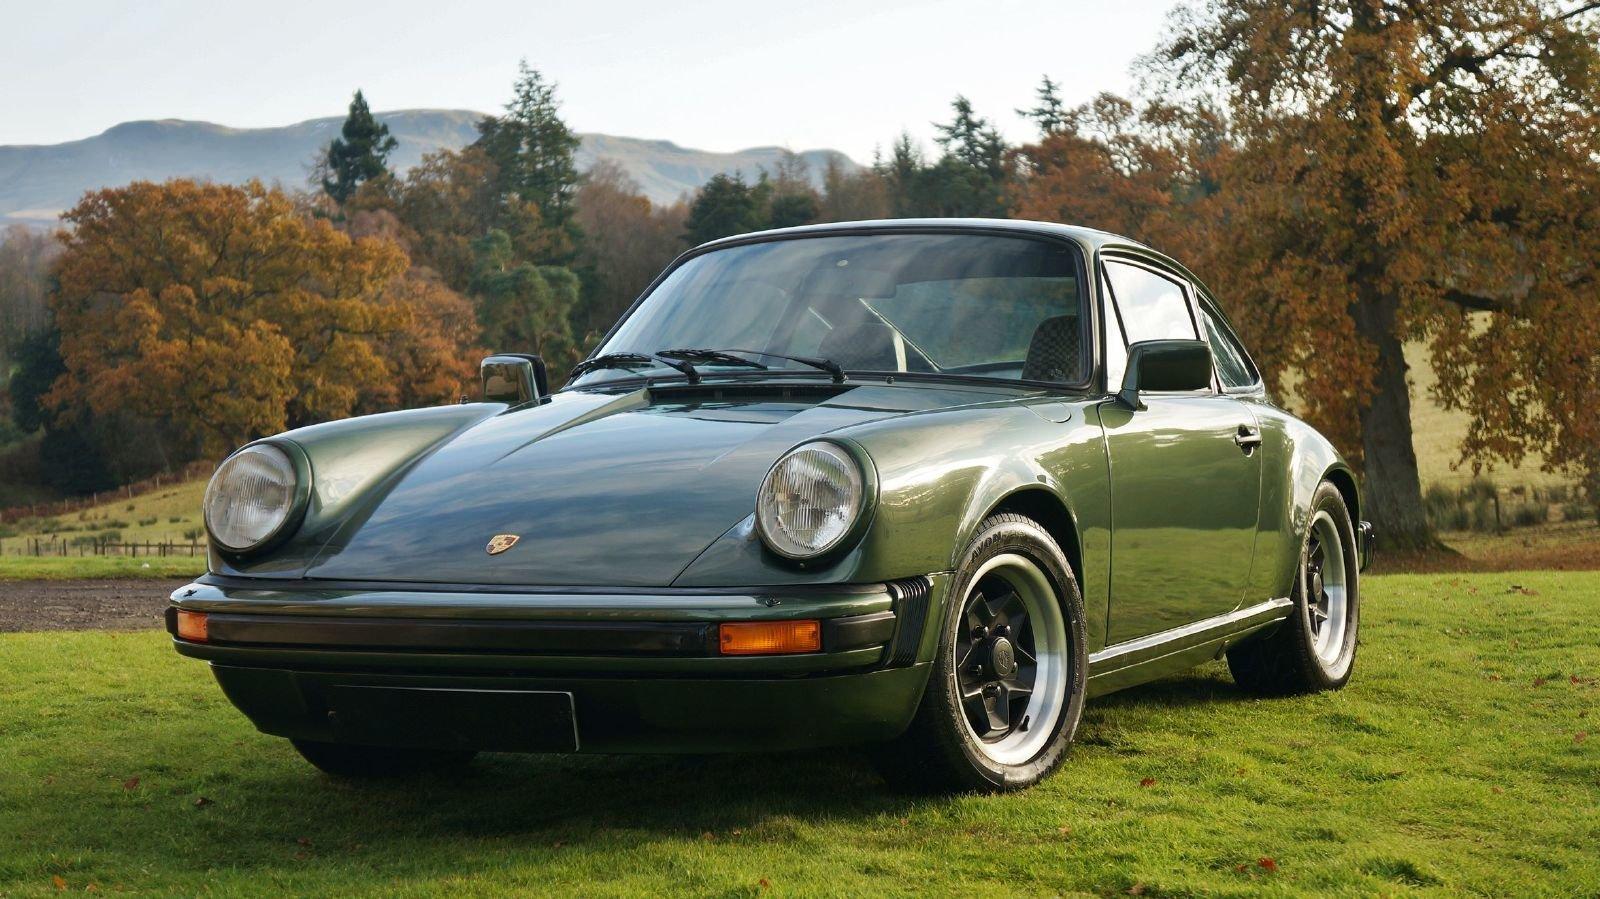 1979 Porsche 911 SC Oak Green Coupe For Sale (picture 1 of 6)